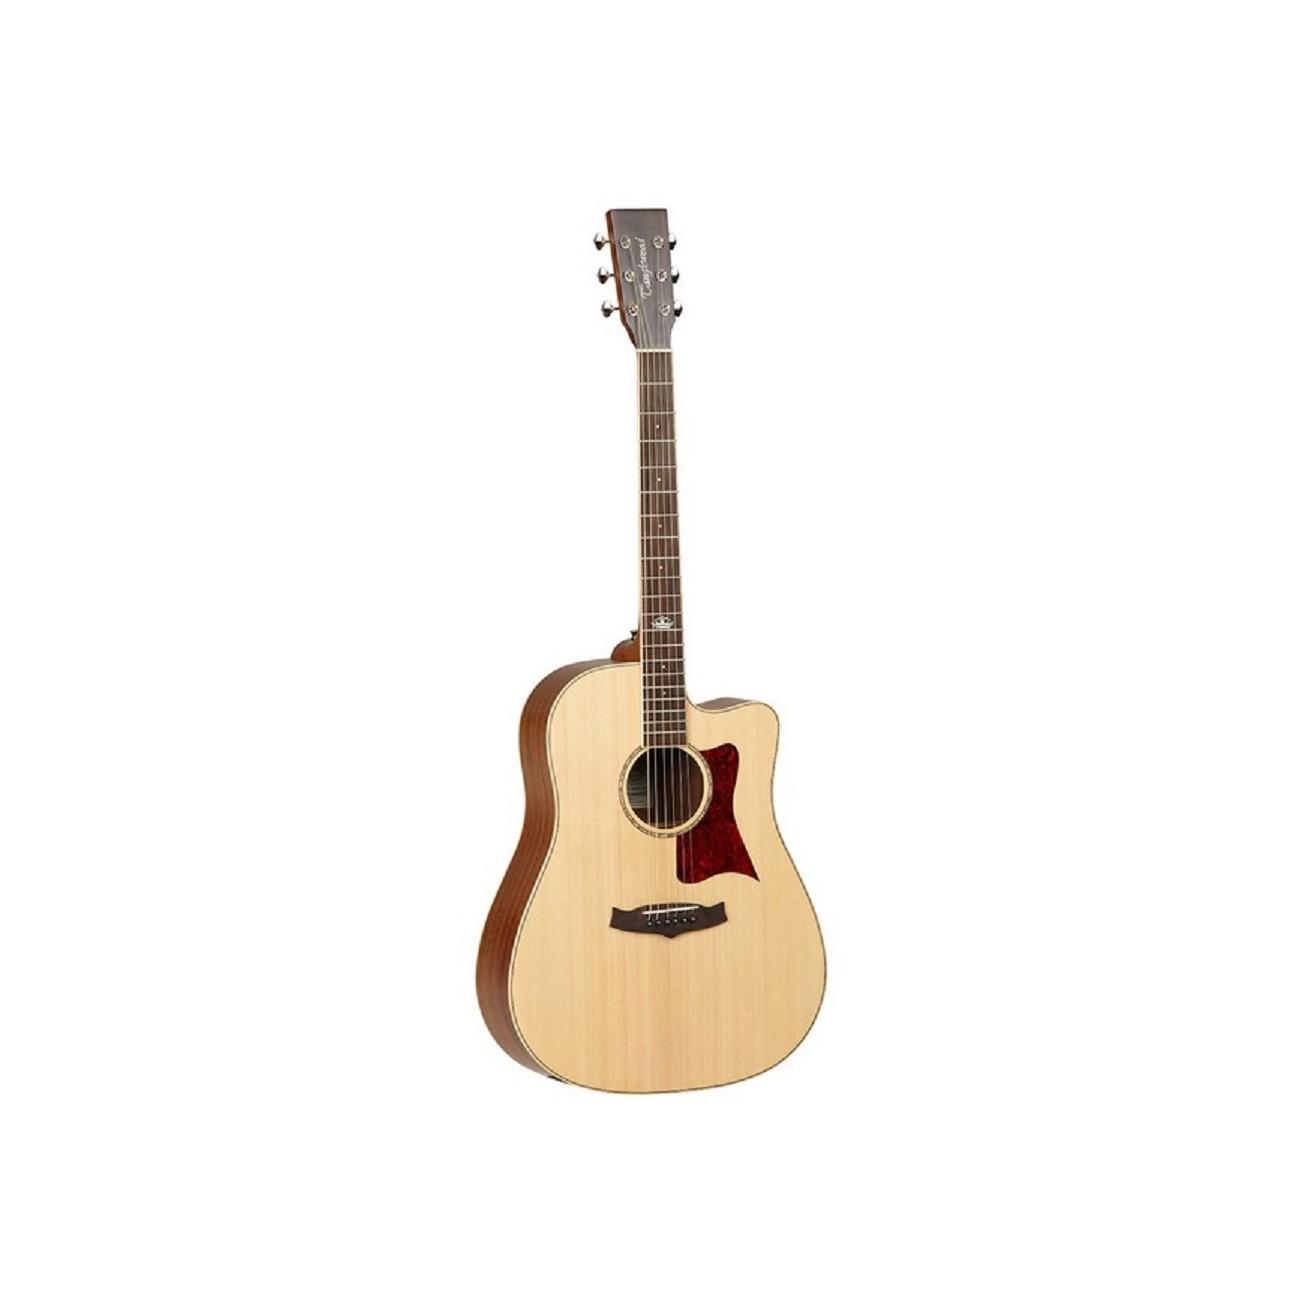 Tanglewood TW115SSCE - Guitarra acústica, acabado natural